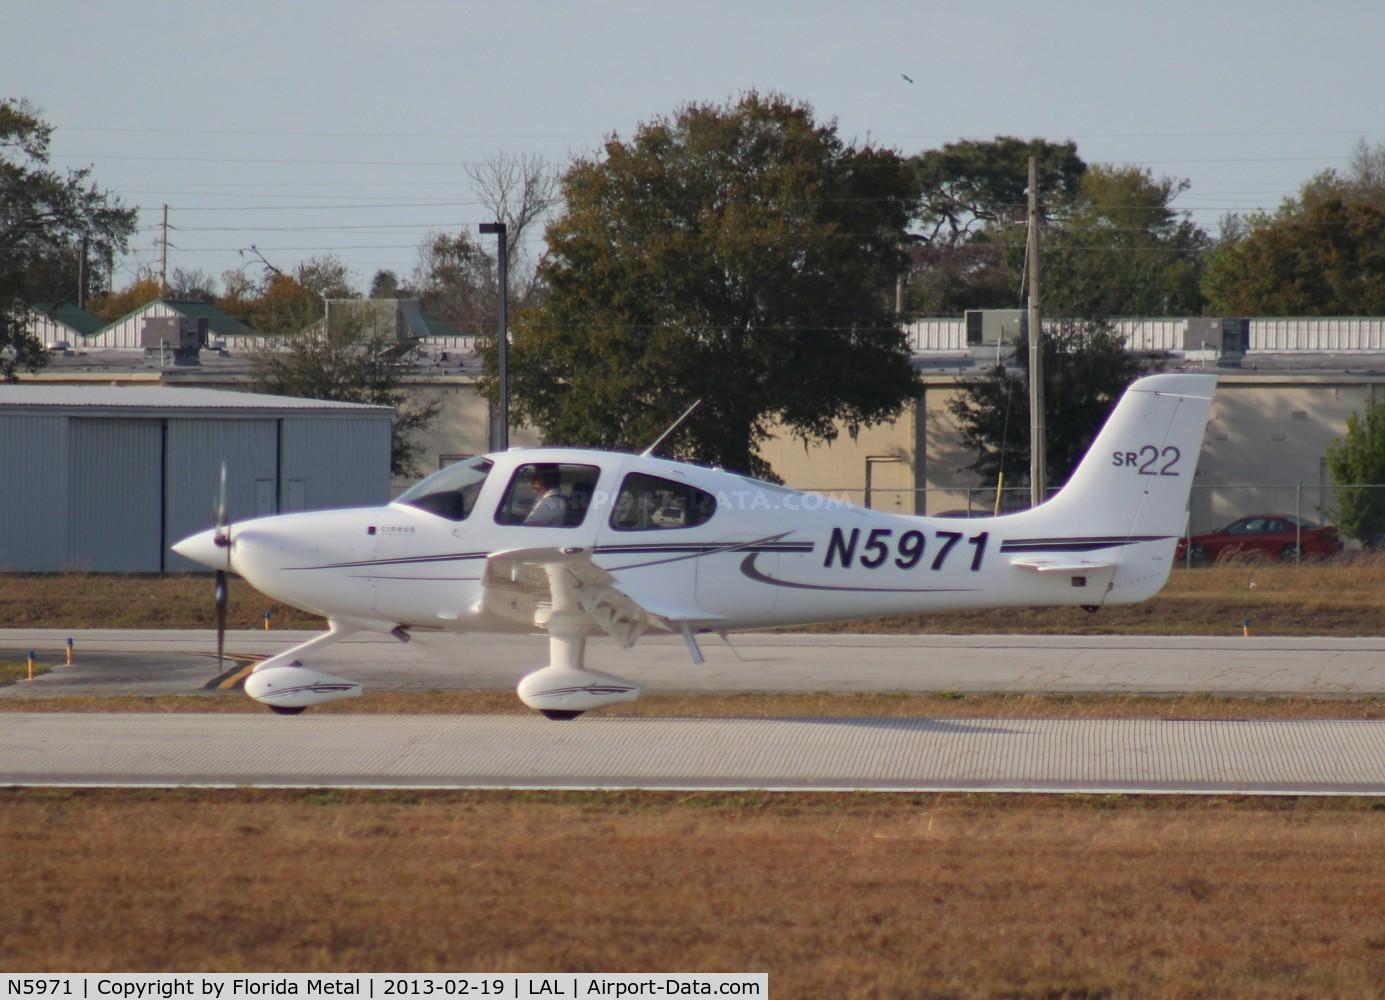 N5971, 2012 Cirrus SR22 C/N 3900, Cirrus SR22